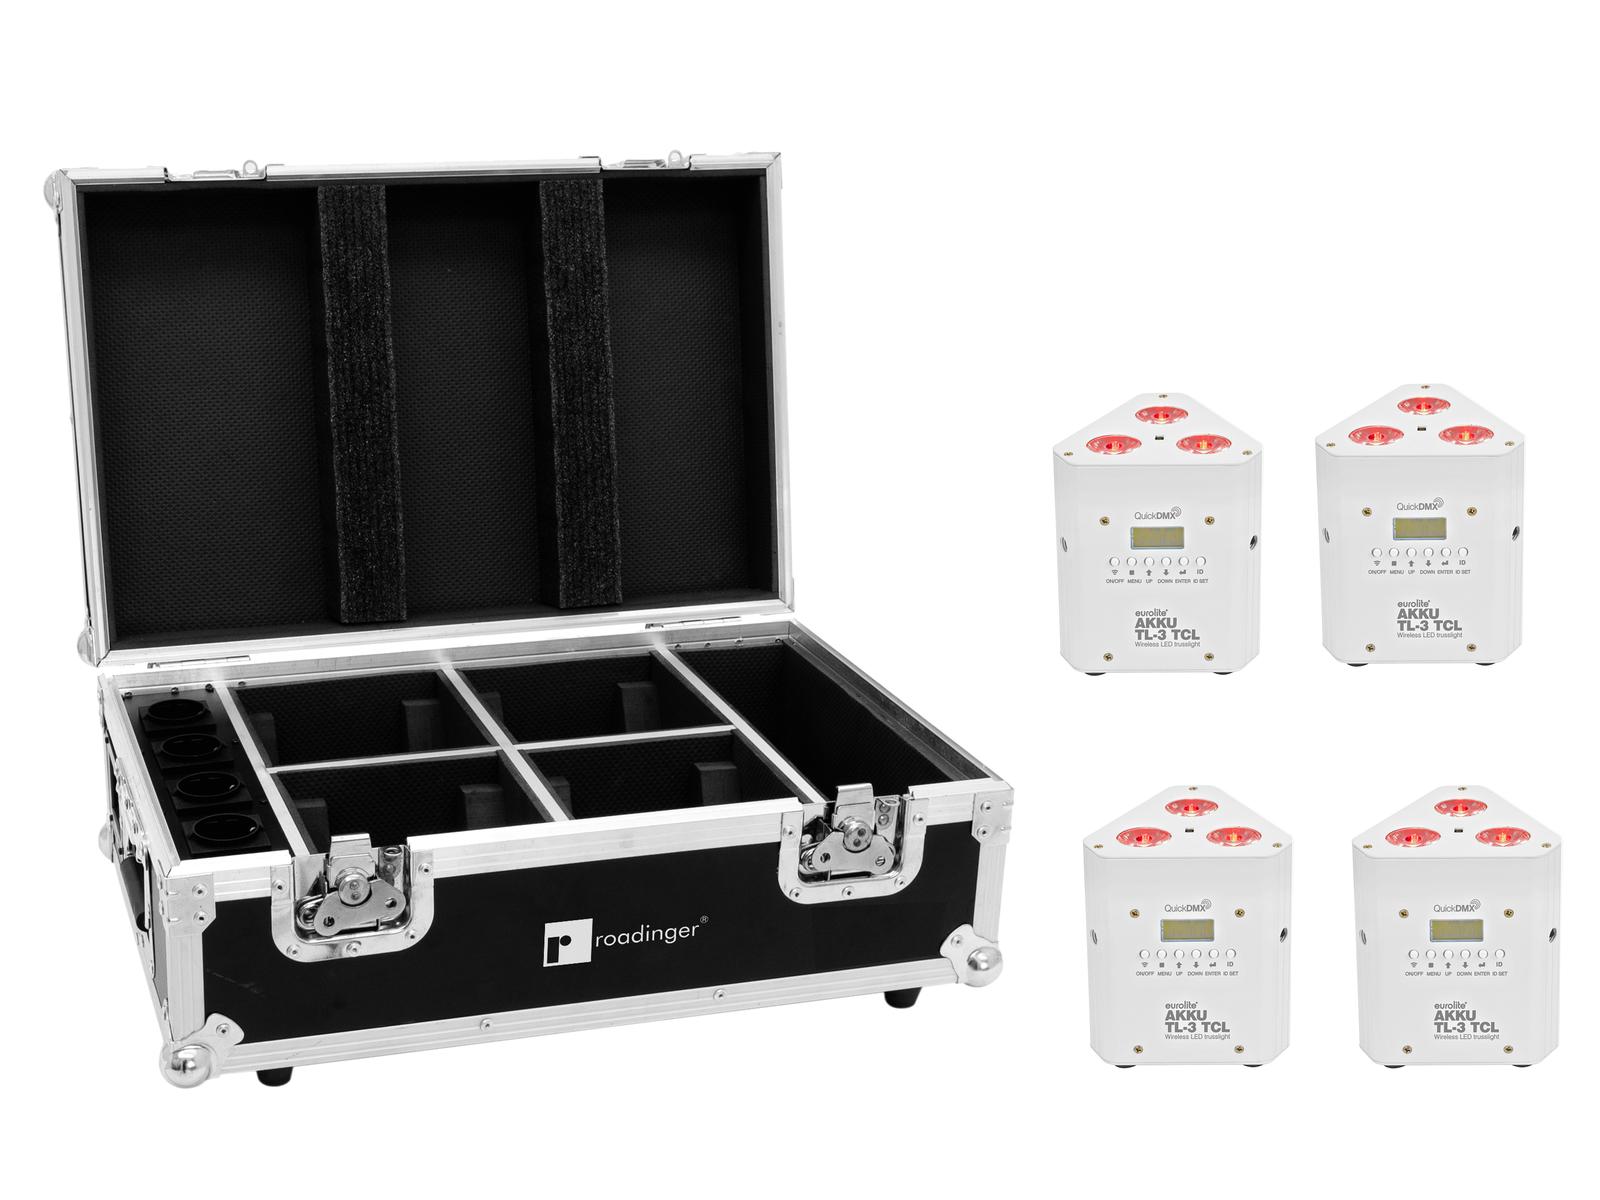 EUROLITE Set 4x AKKU TL-3 TCL weiß + Case mit Ladefunktion